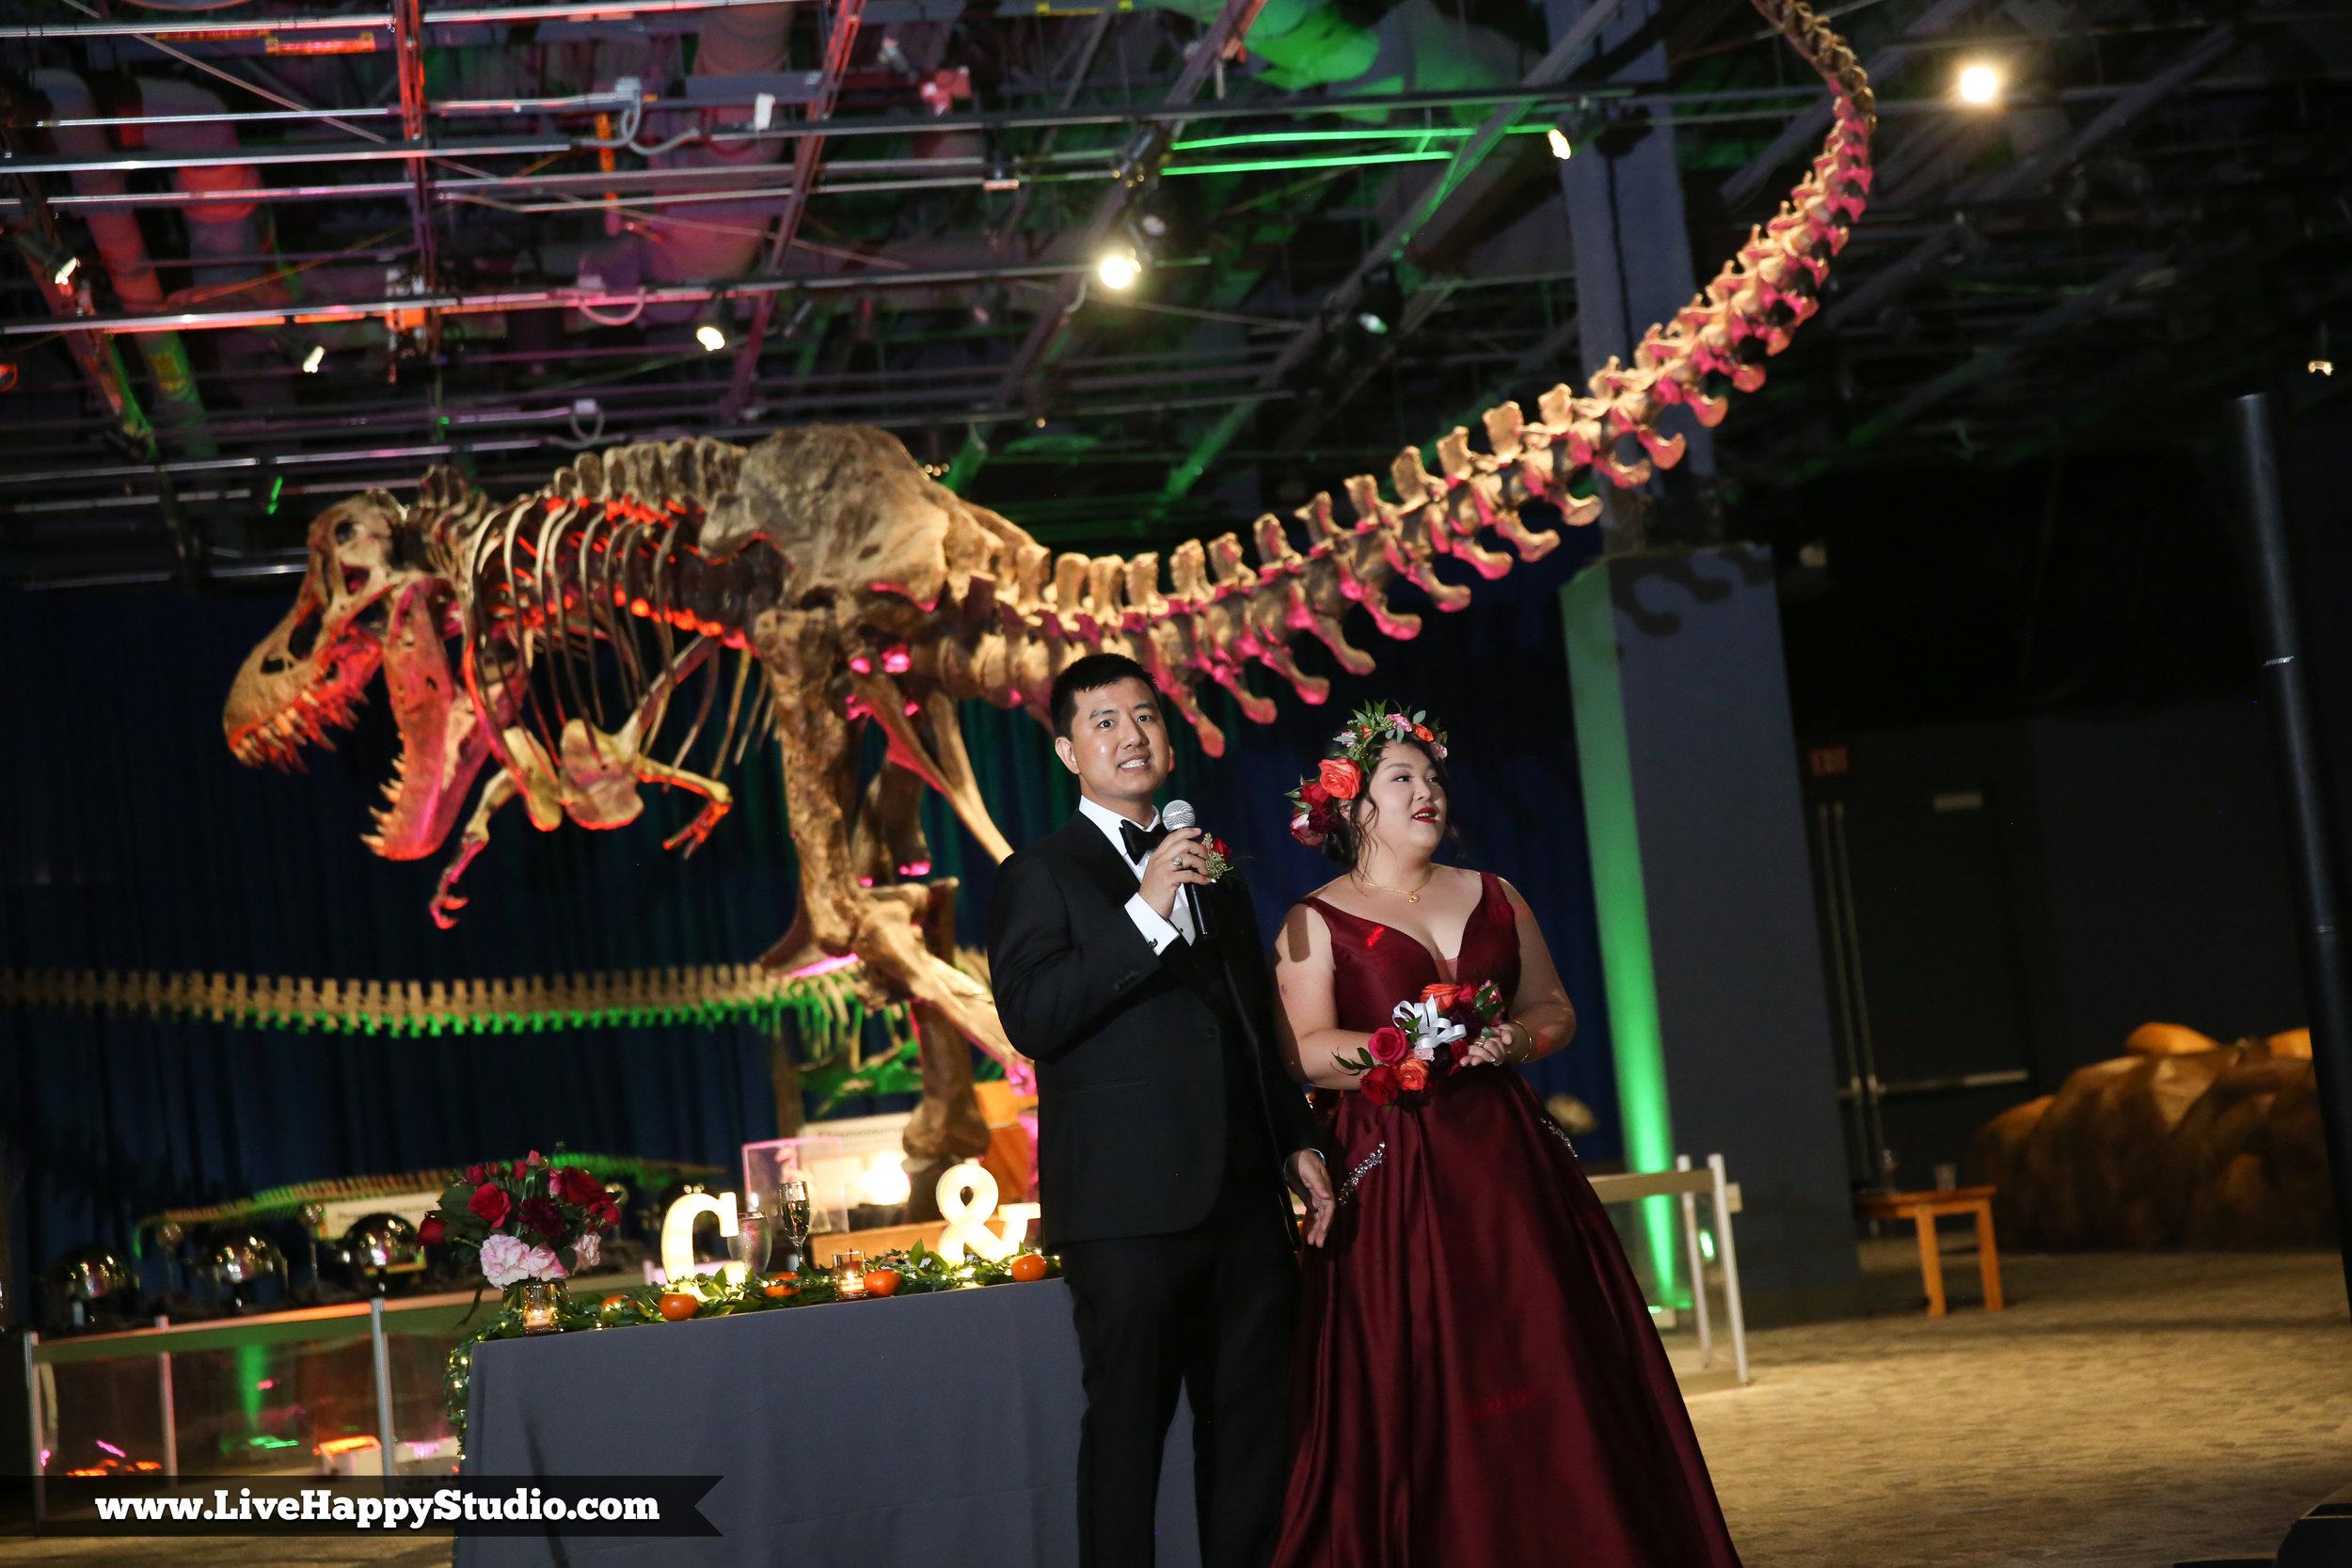 www.livehappystudio.com-orlando-science-center-museum-wedding-photography-photographer-candid-speech-dinosaur24.jpg